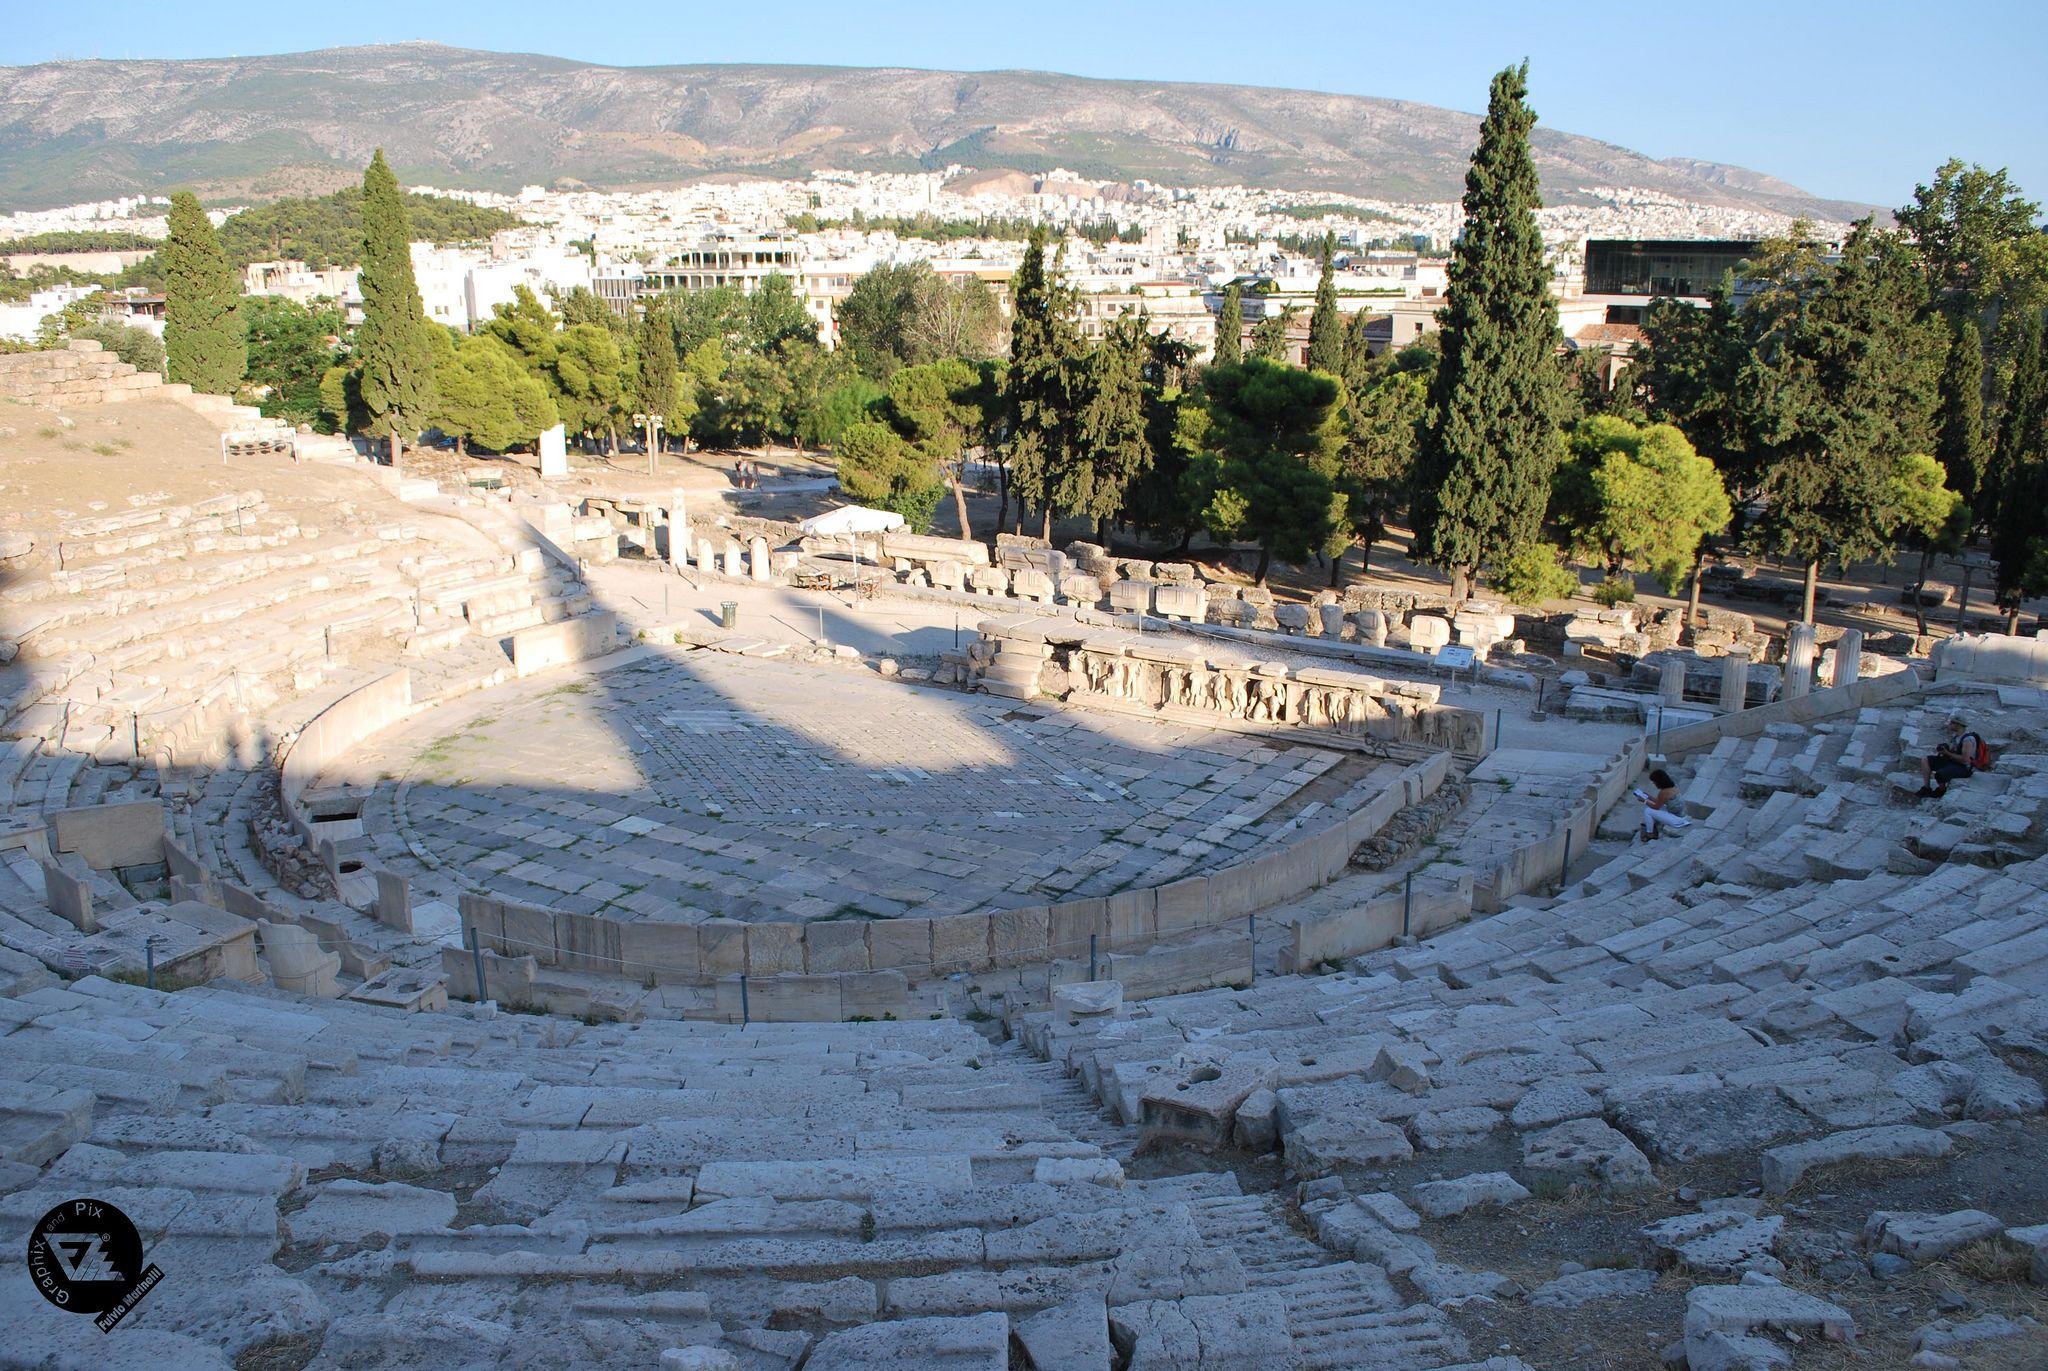 https://flic.kr/p/fwT41y | teatro di Dioniso